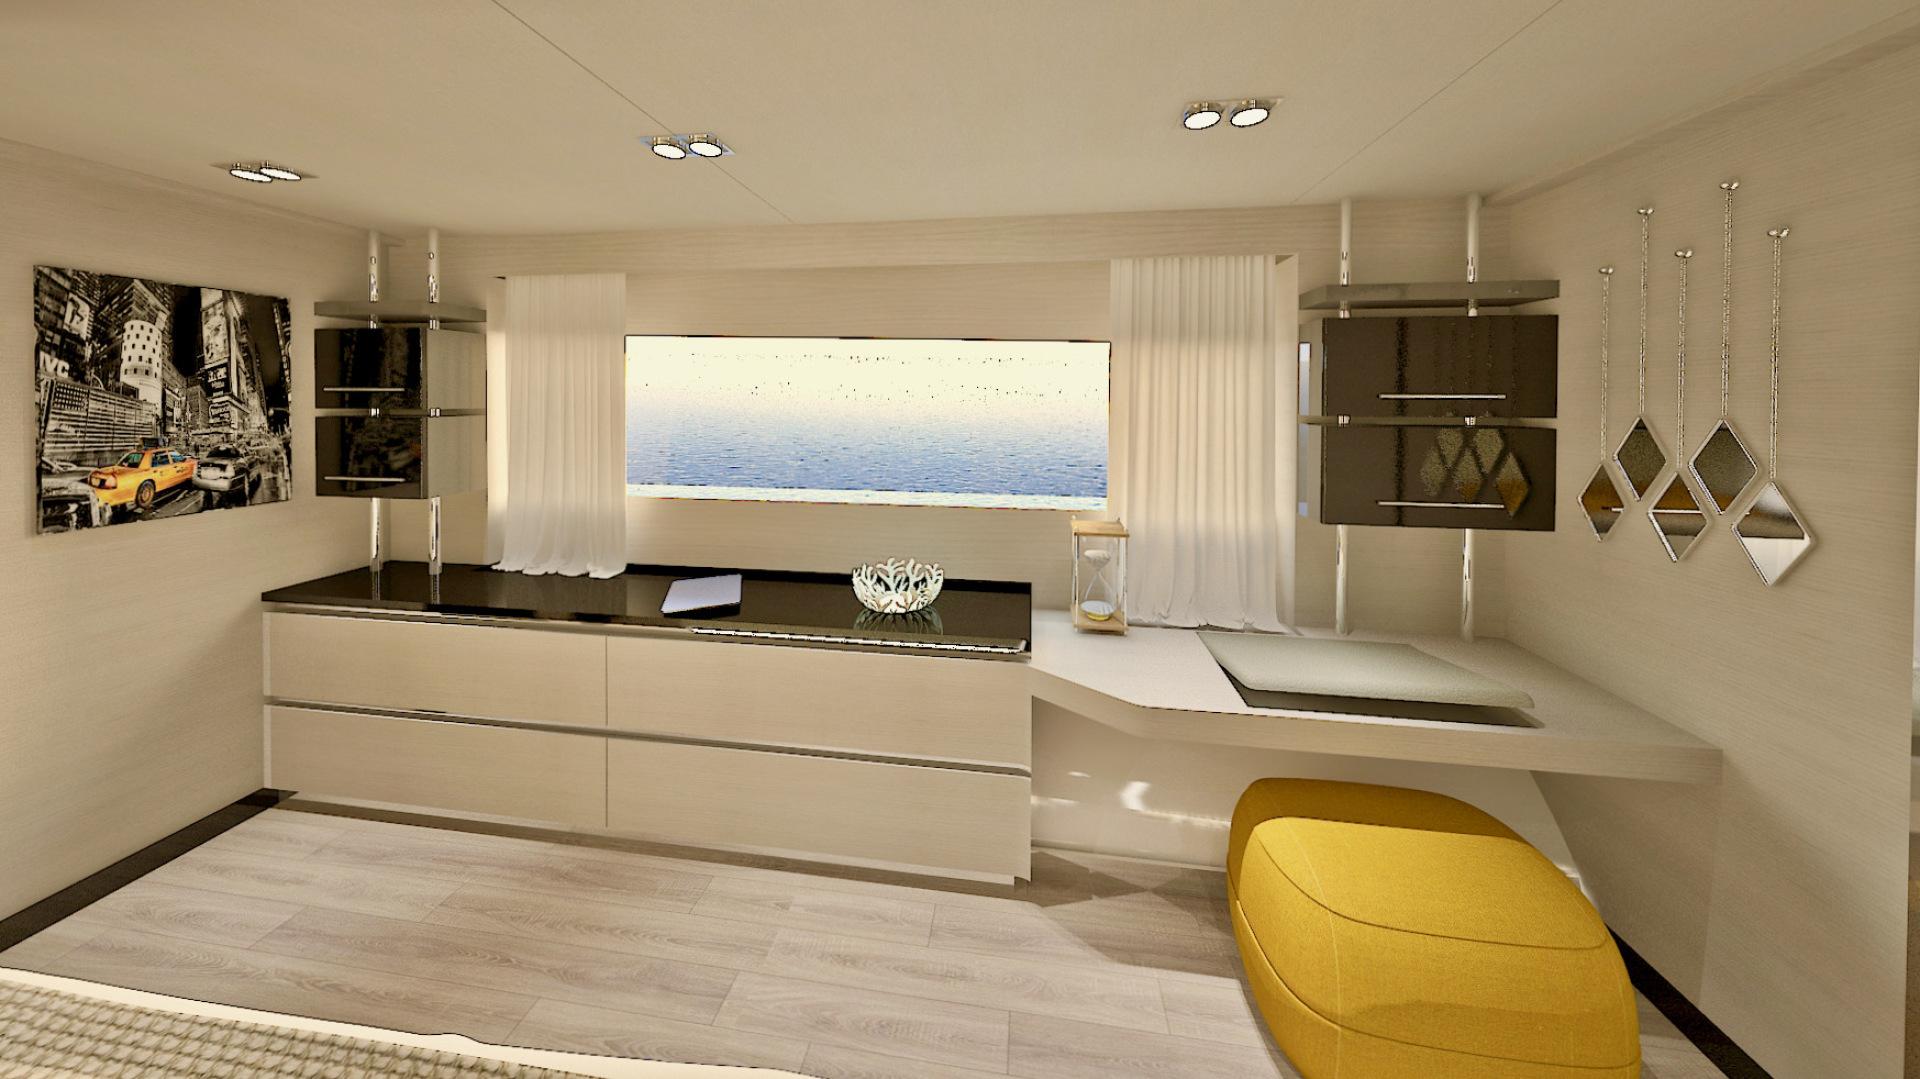 Silent-Yachts-Silent 80  2020-SILENT 80 Ancona-Italy-Master Stateroom-1262447 | Thumbnail